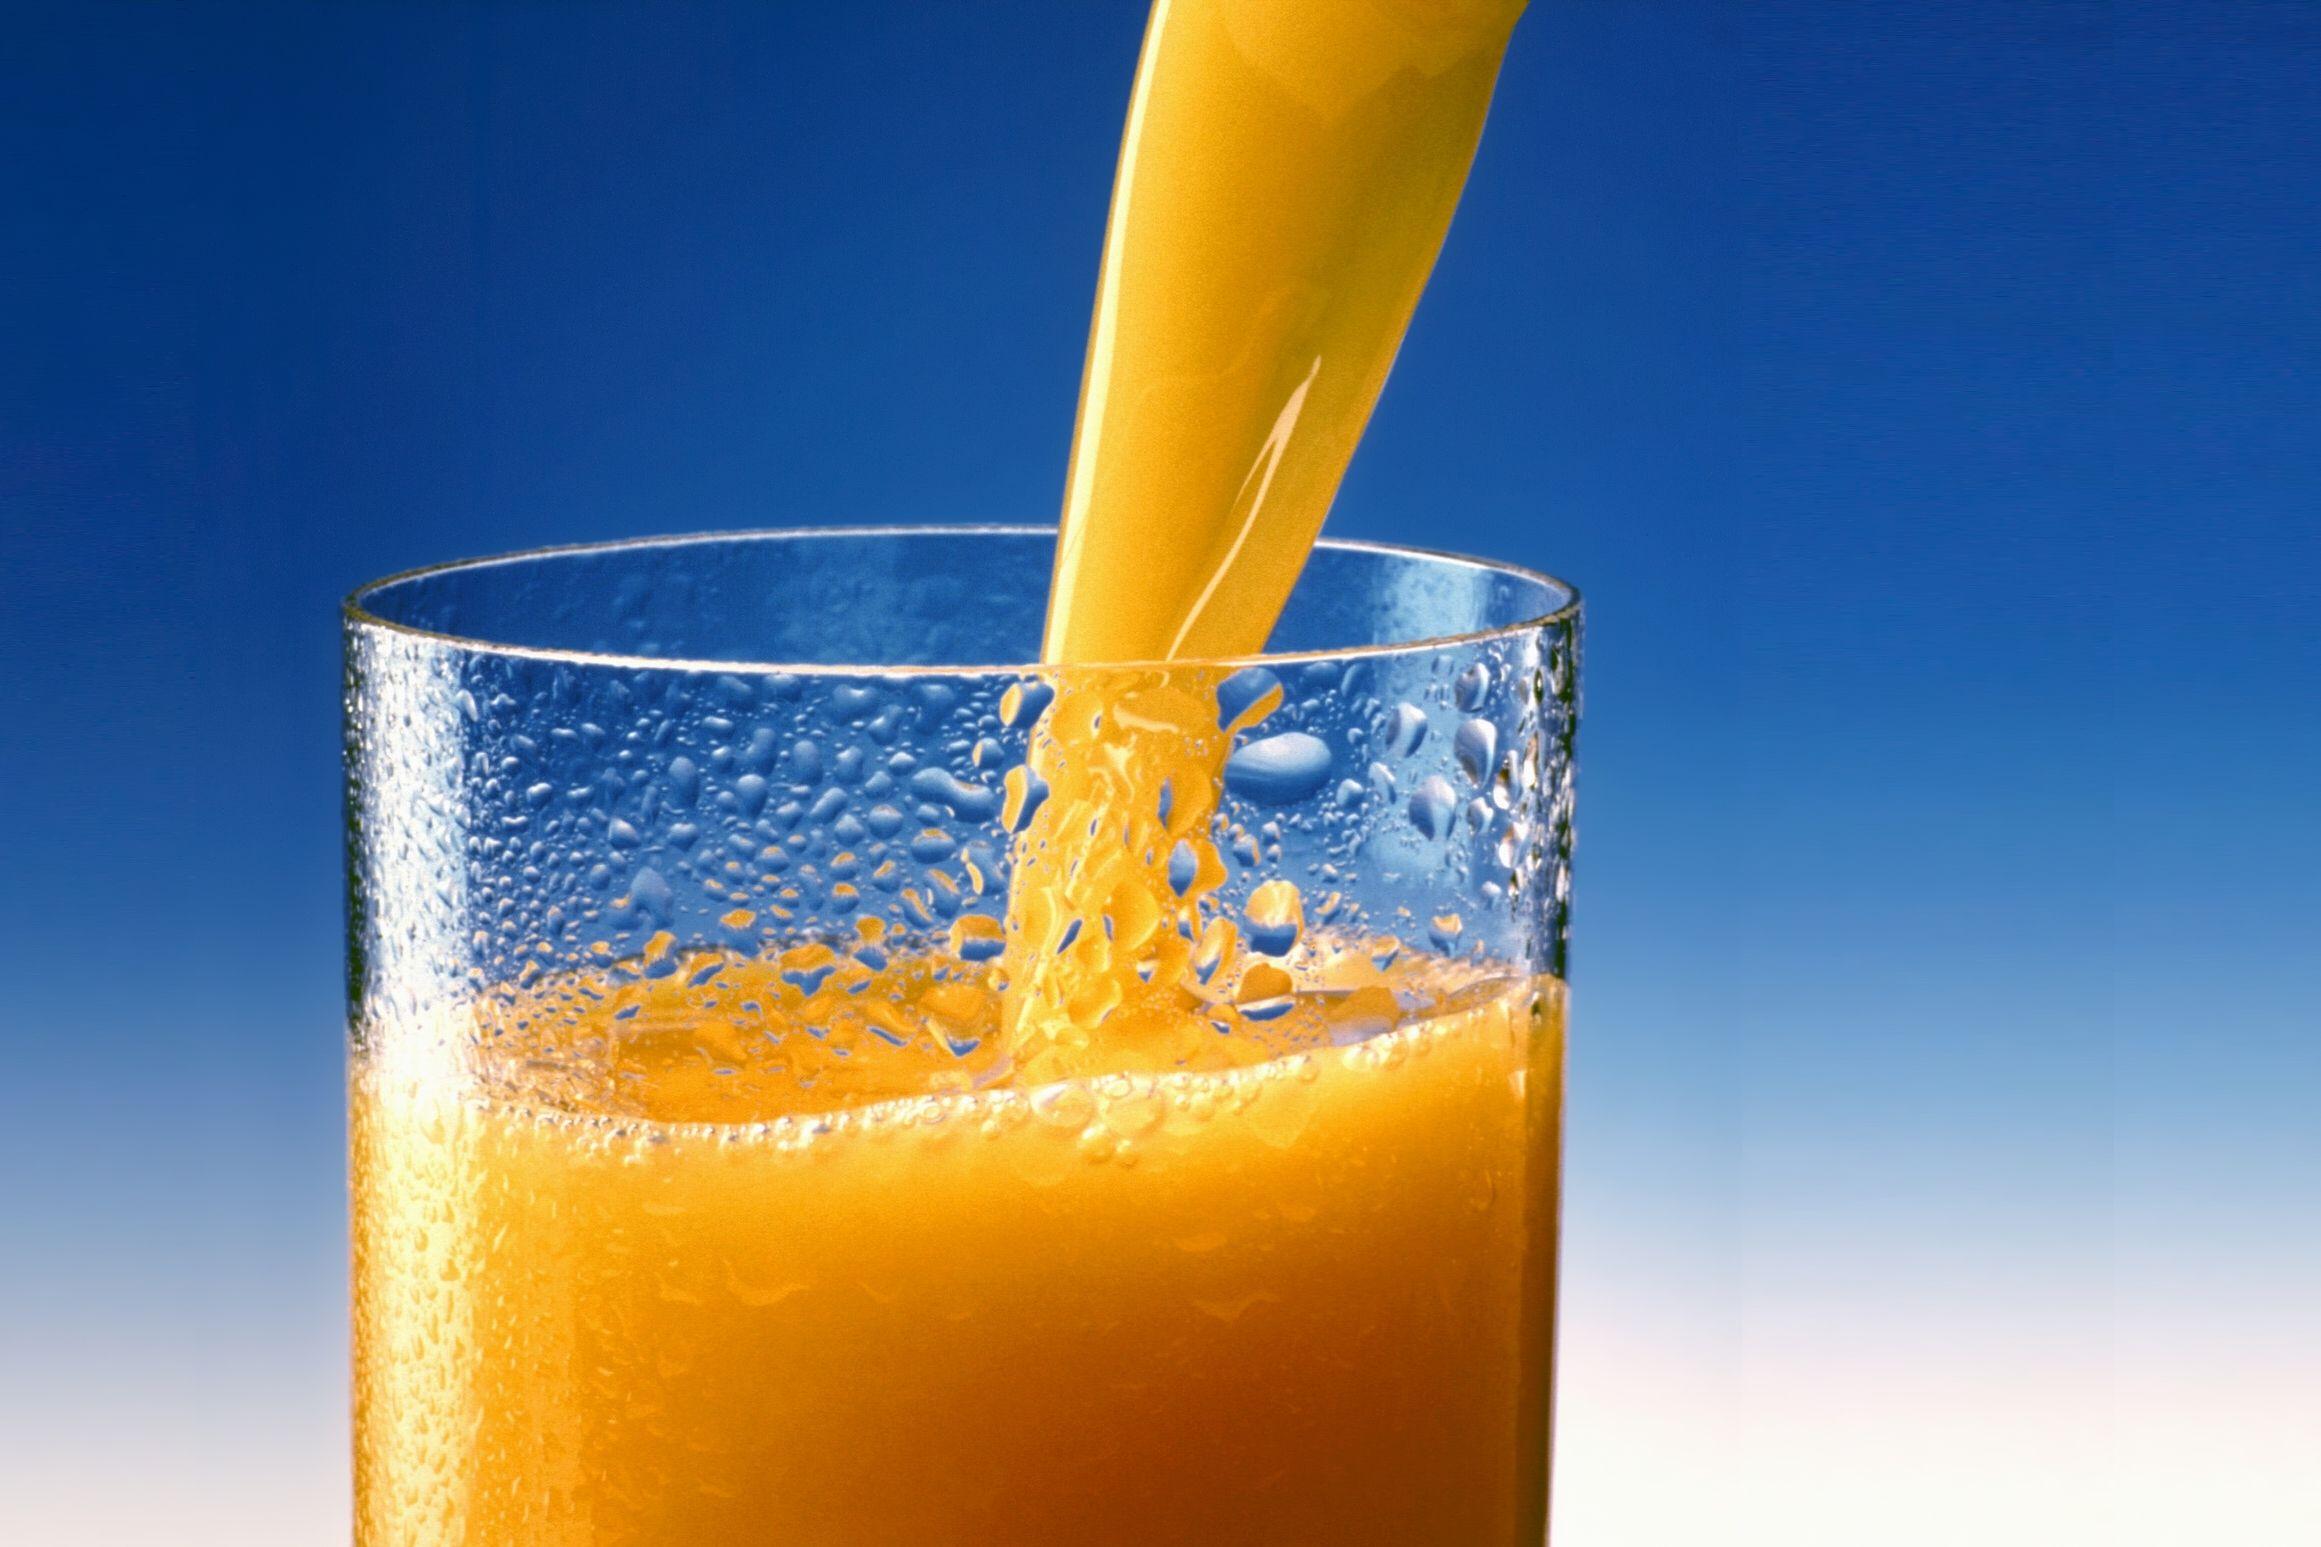 Orange juice zpjeqm